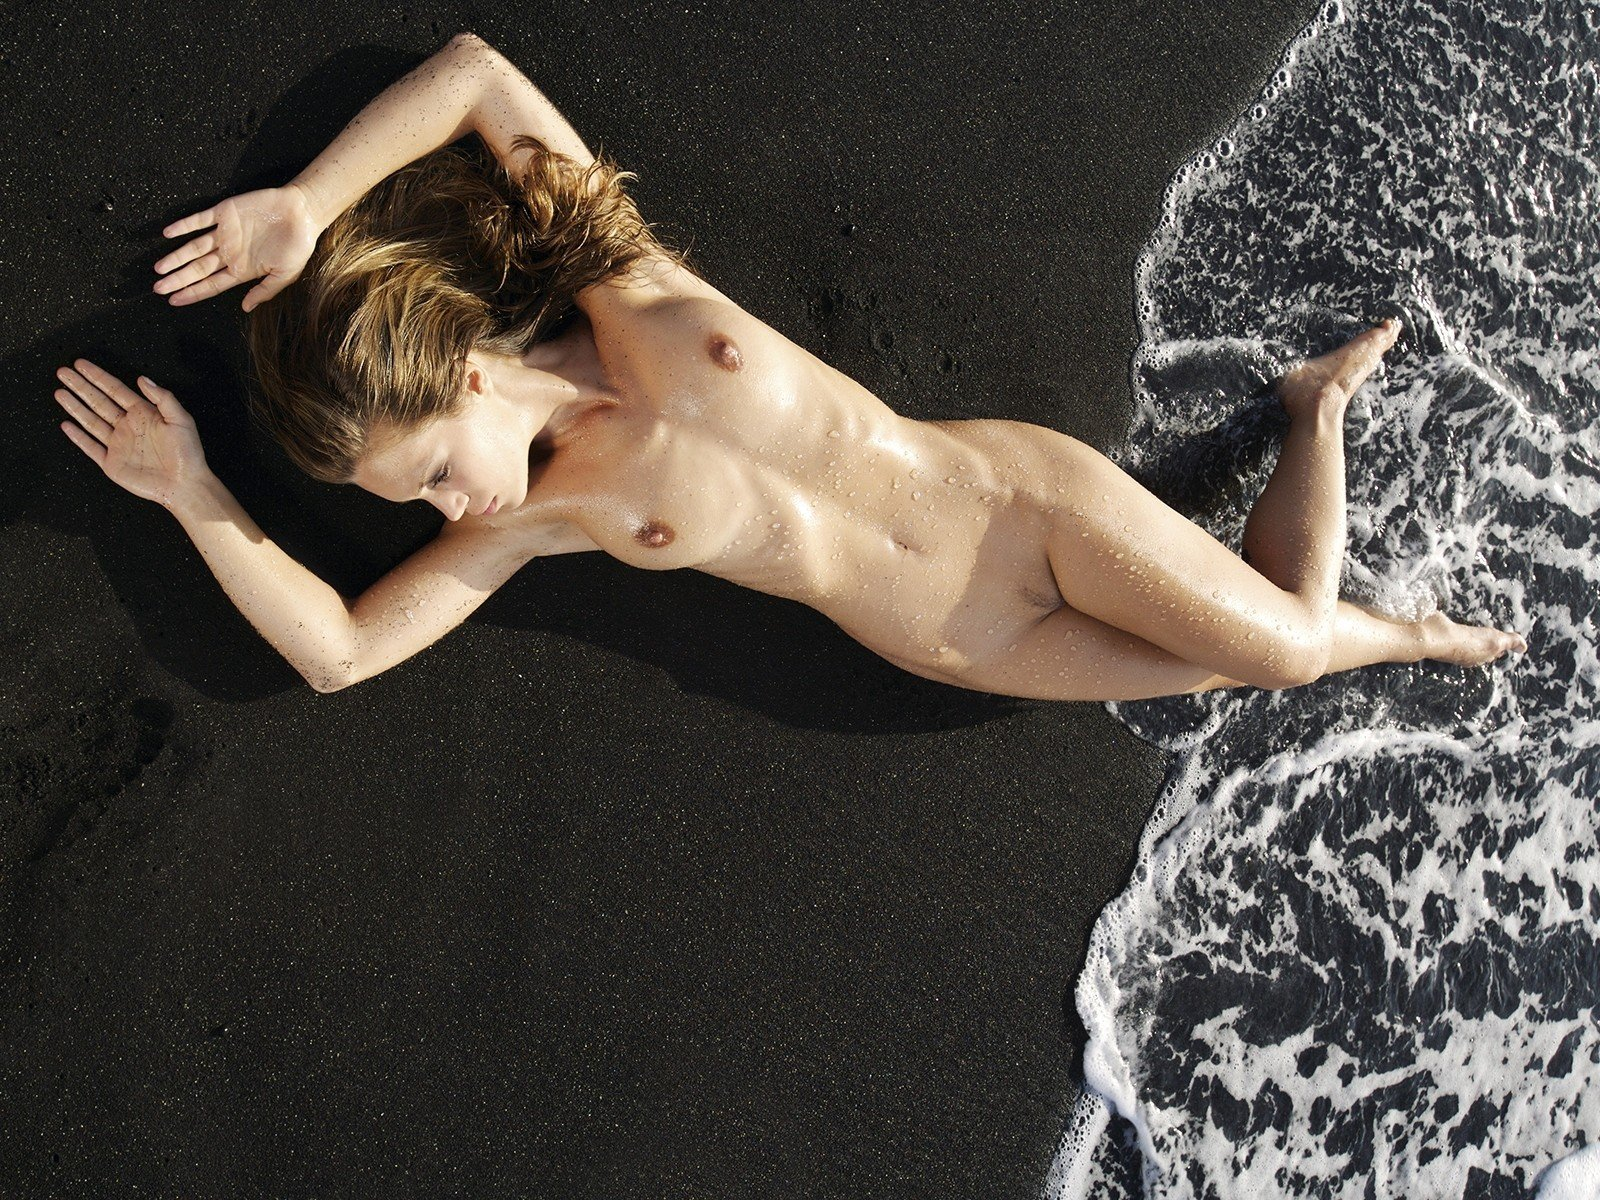 nudity-sea-figure-pose